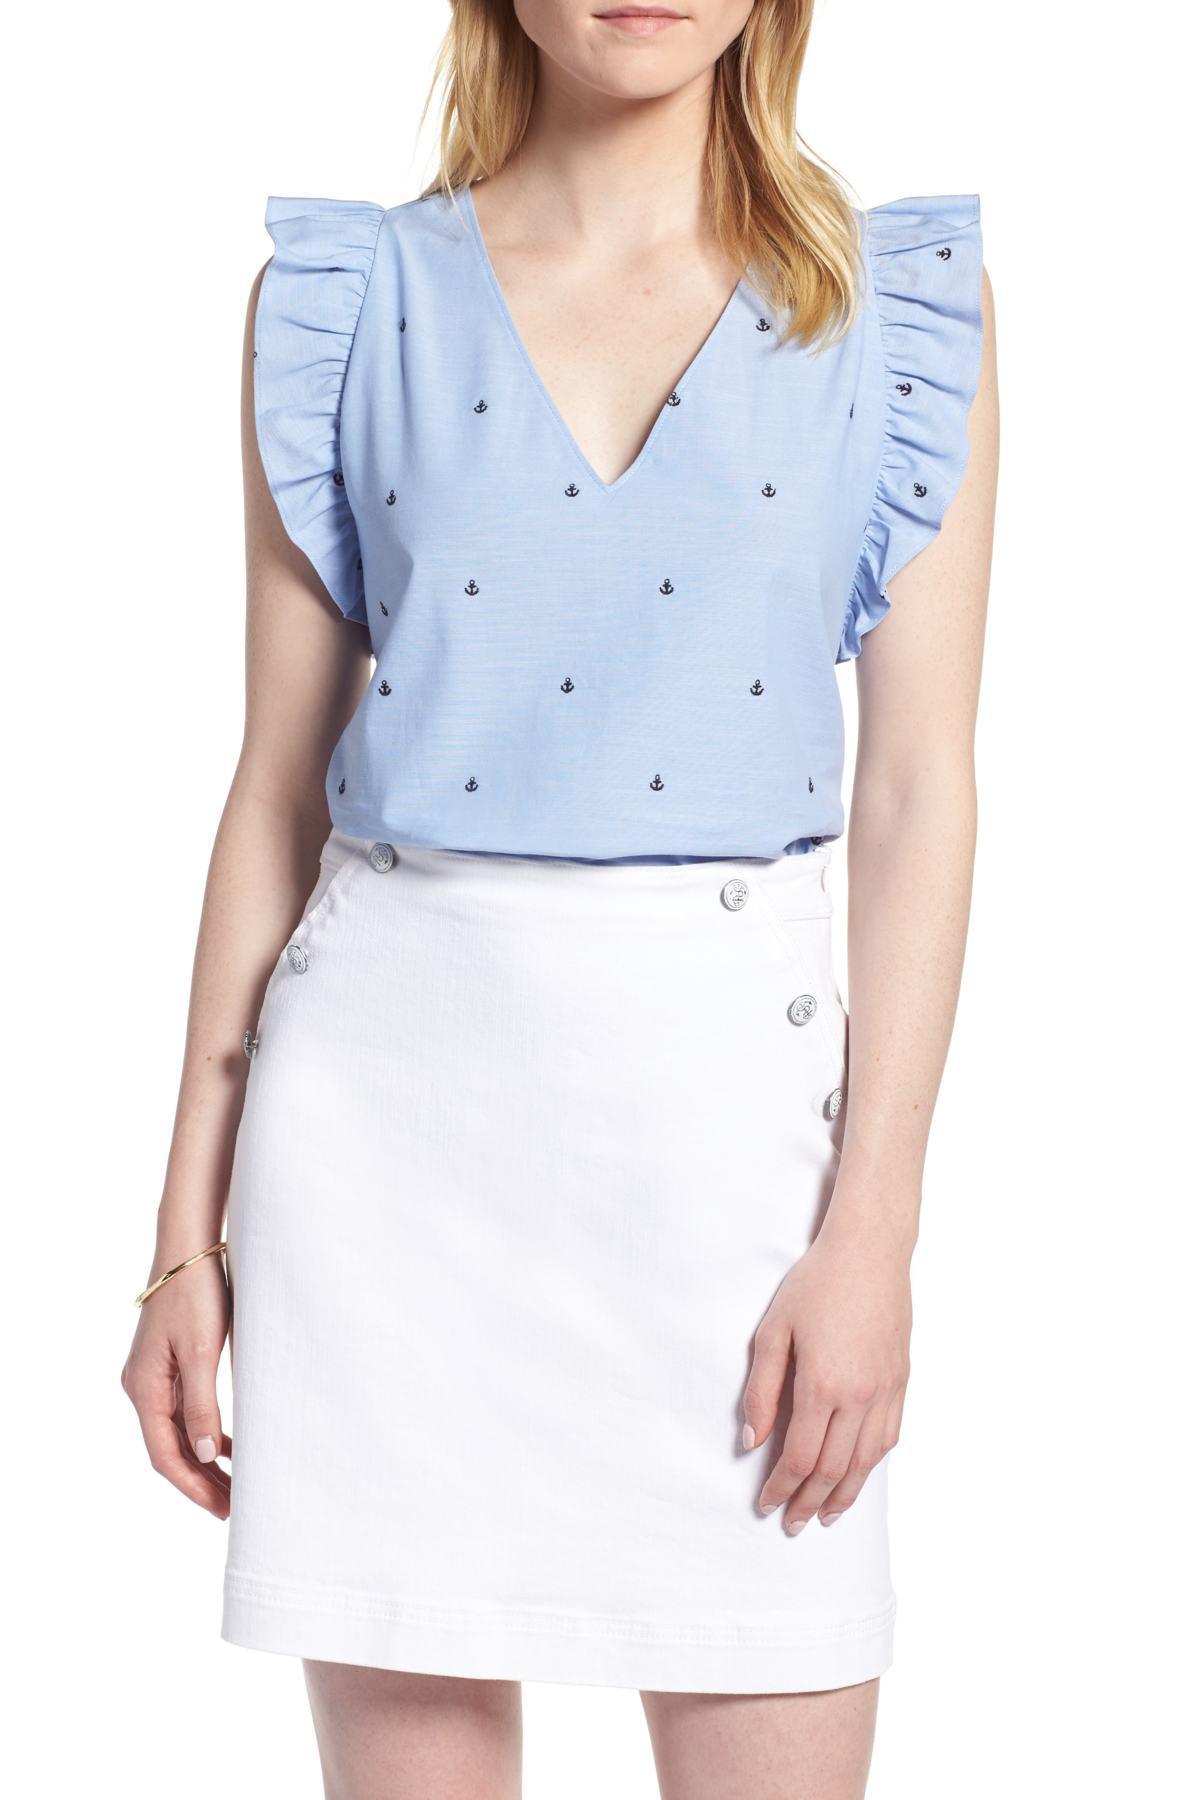 4c5e814833e Lyst - 1901 Anchor Embroidery Cotton Chambray Top (regular   Petite ...